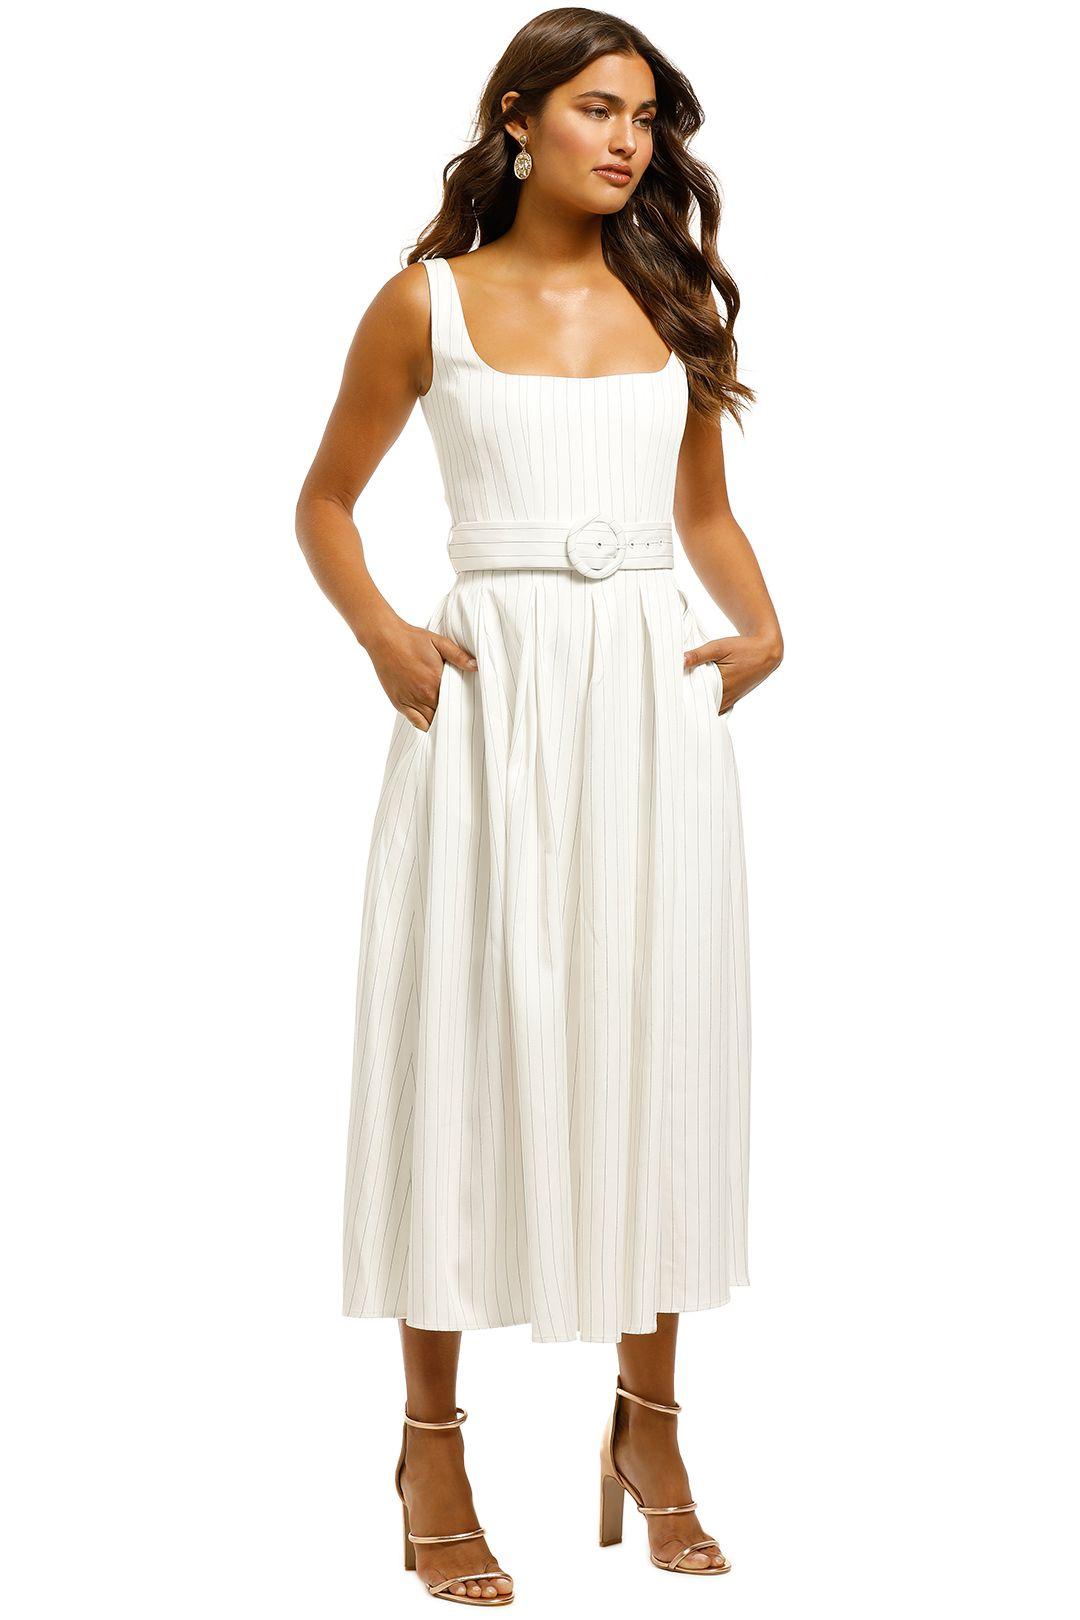 Misha-Karmella-Dress-Ivory-Side